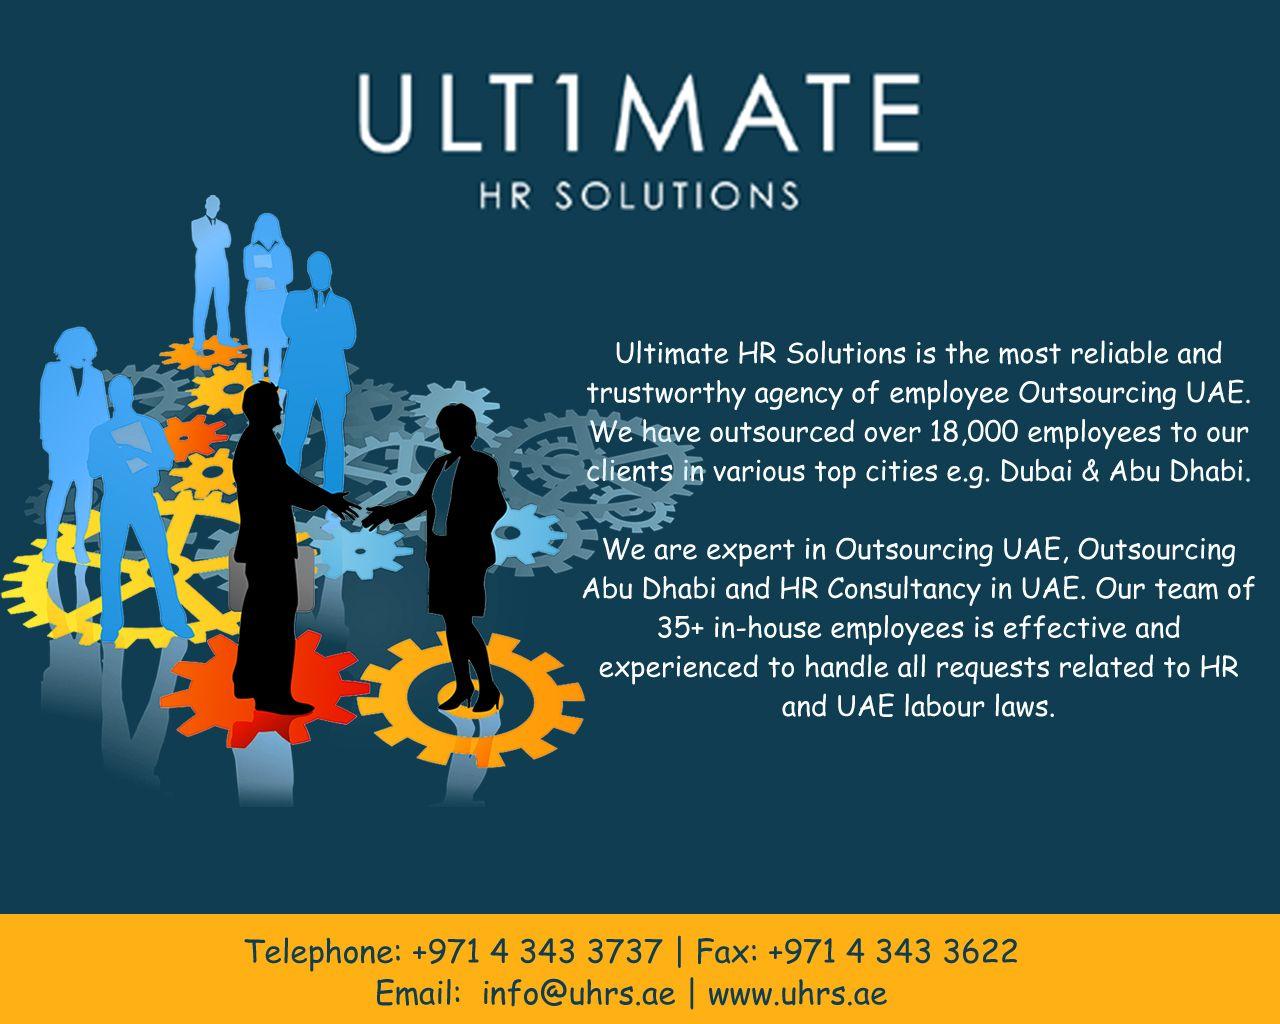 Outsourcing Dubai Outsourcing Abu Dhabi Ultimate HR